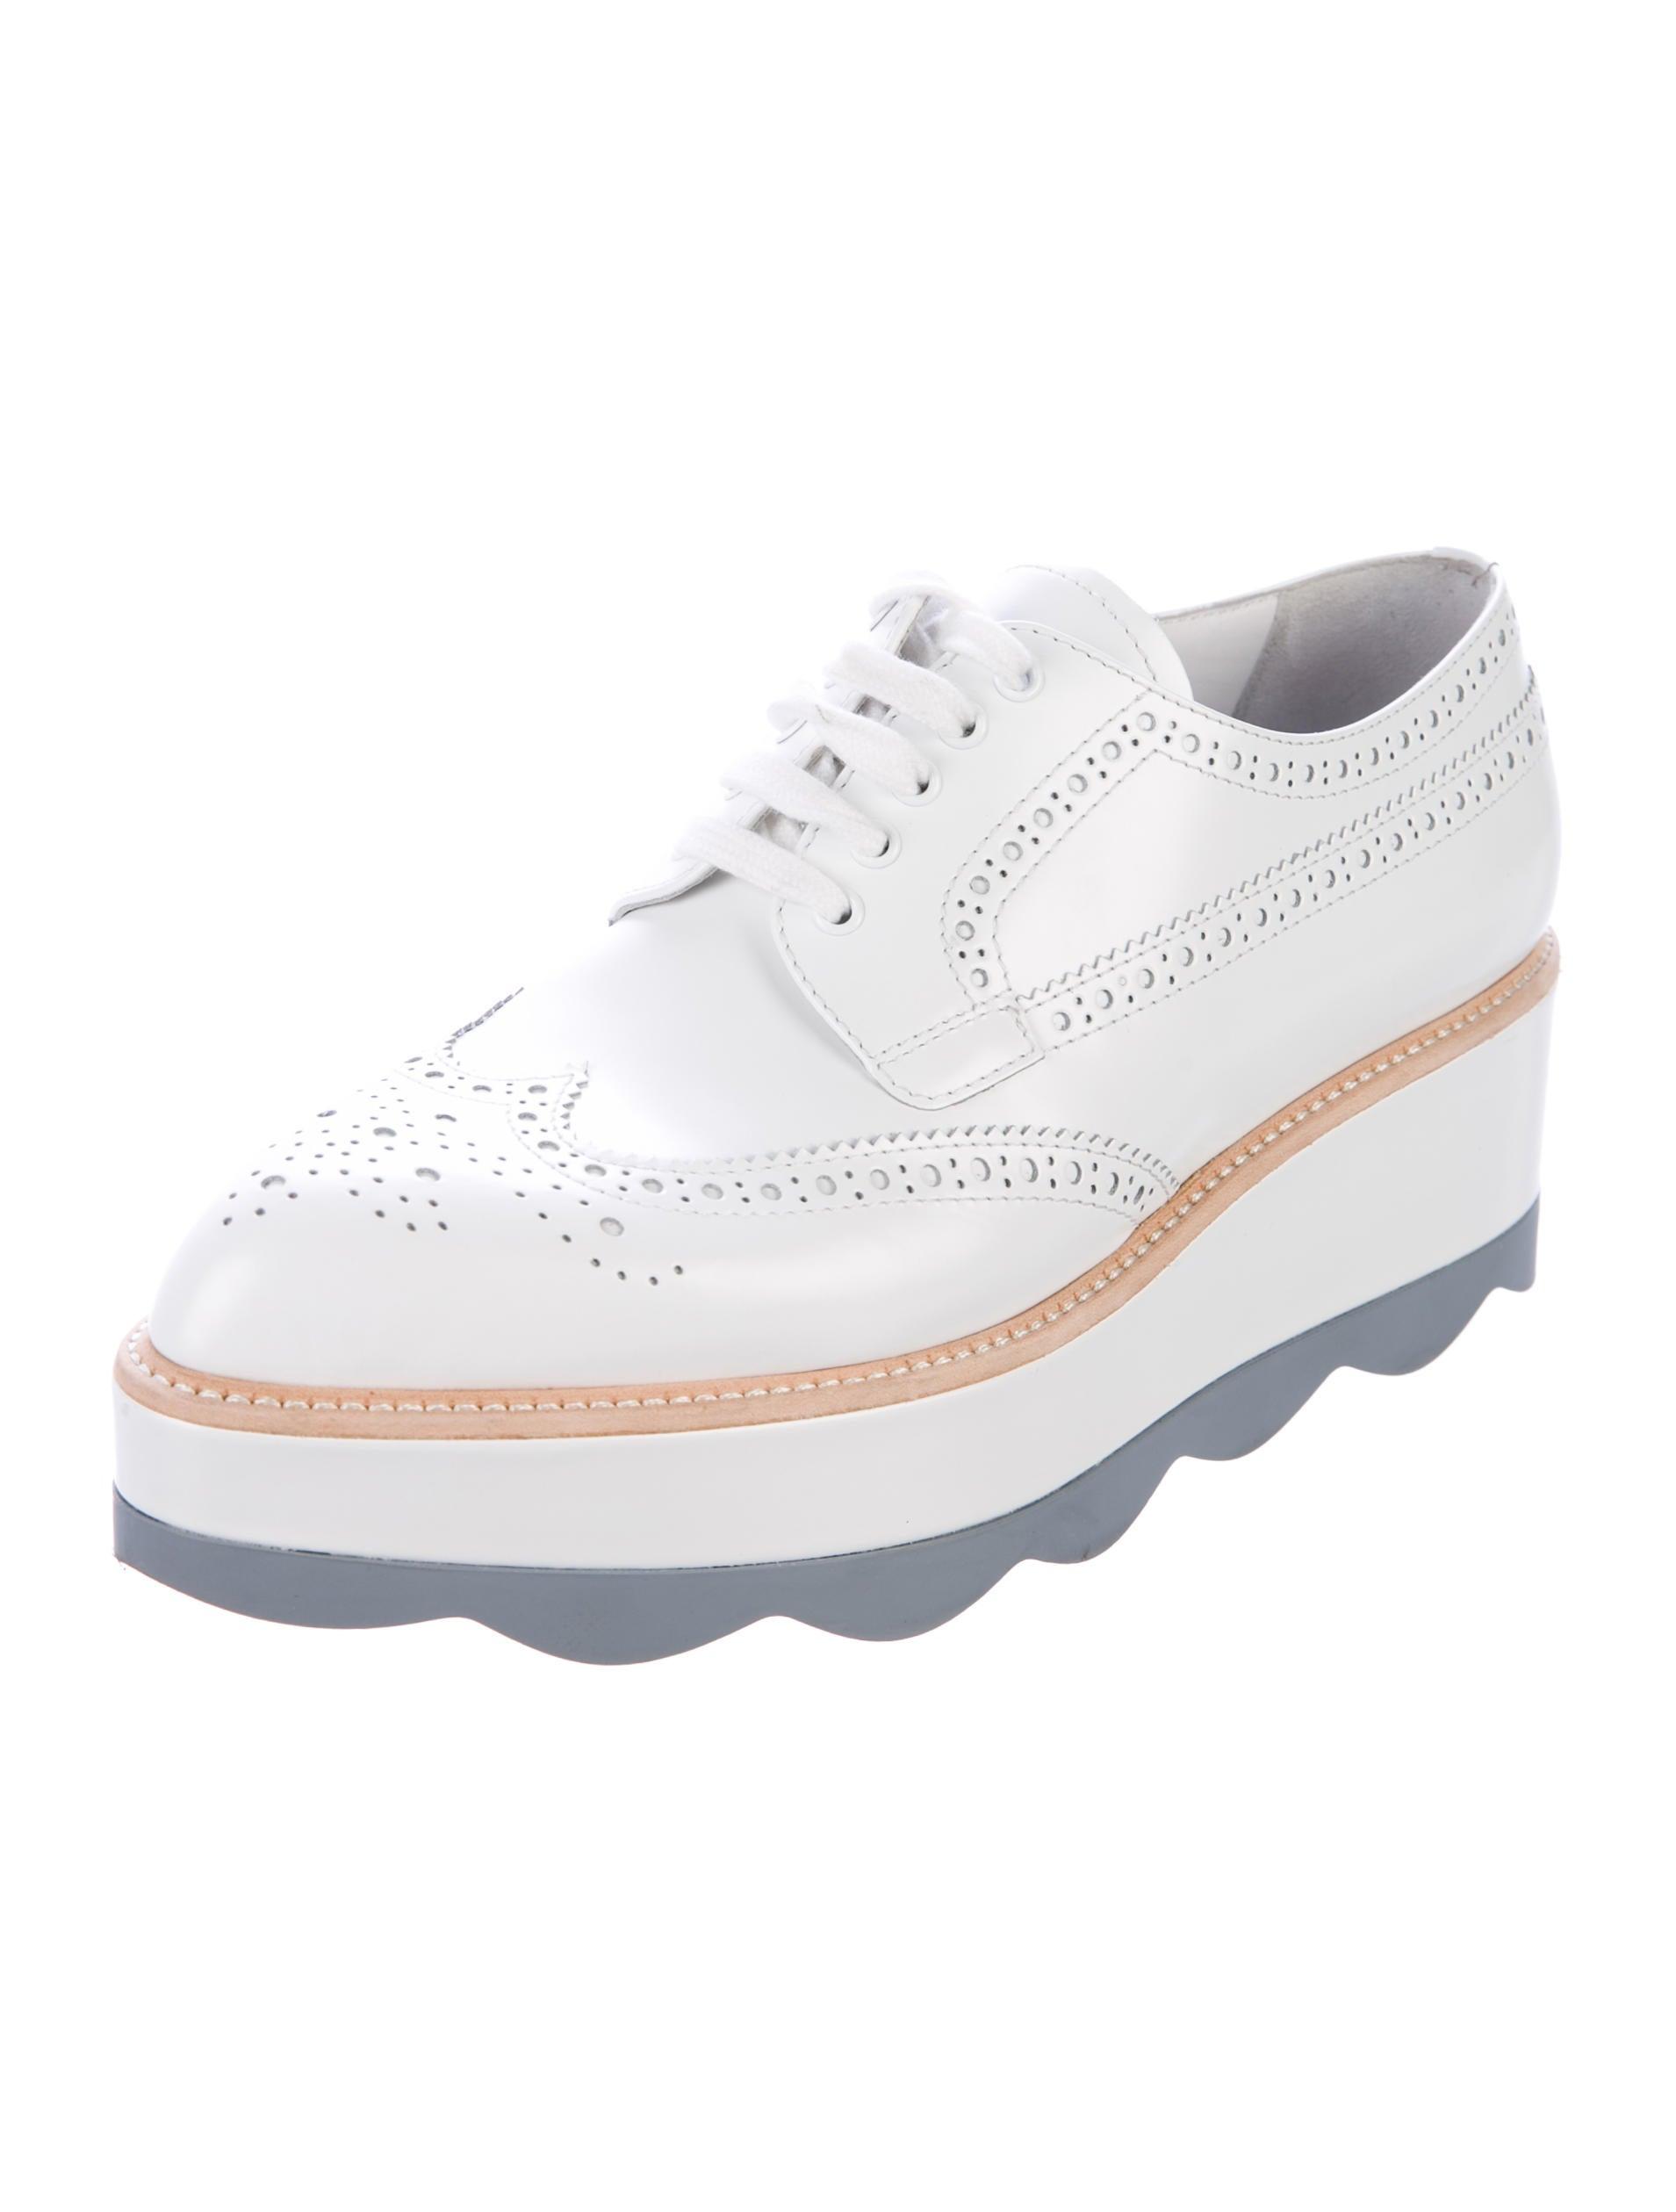 Prada Lace Up Platform Shoes